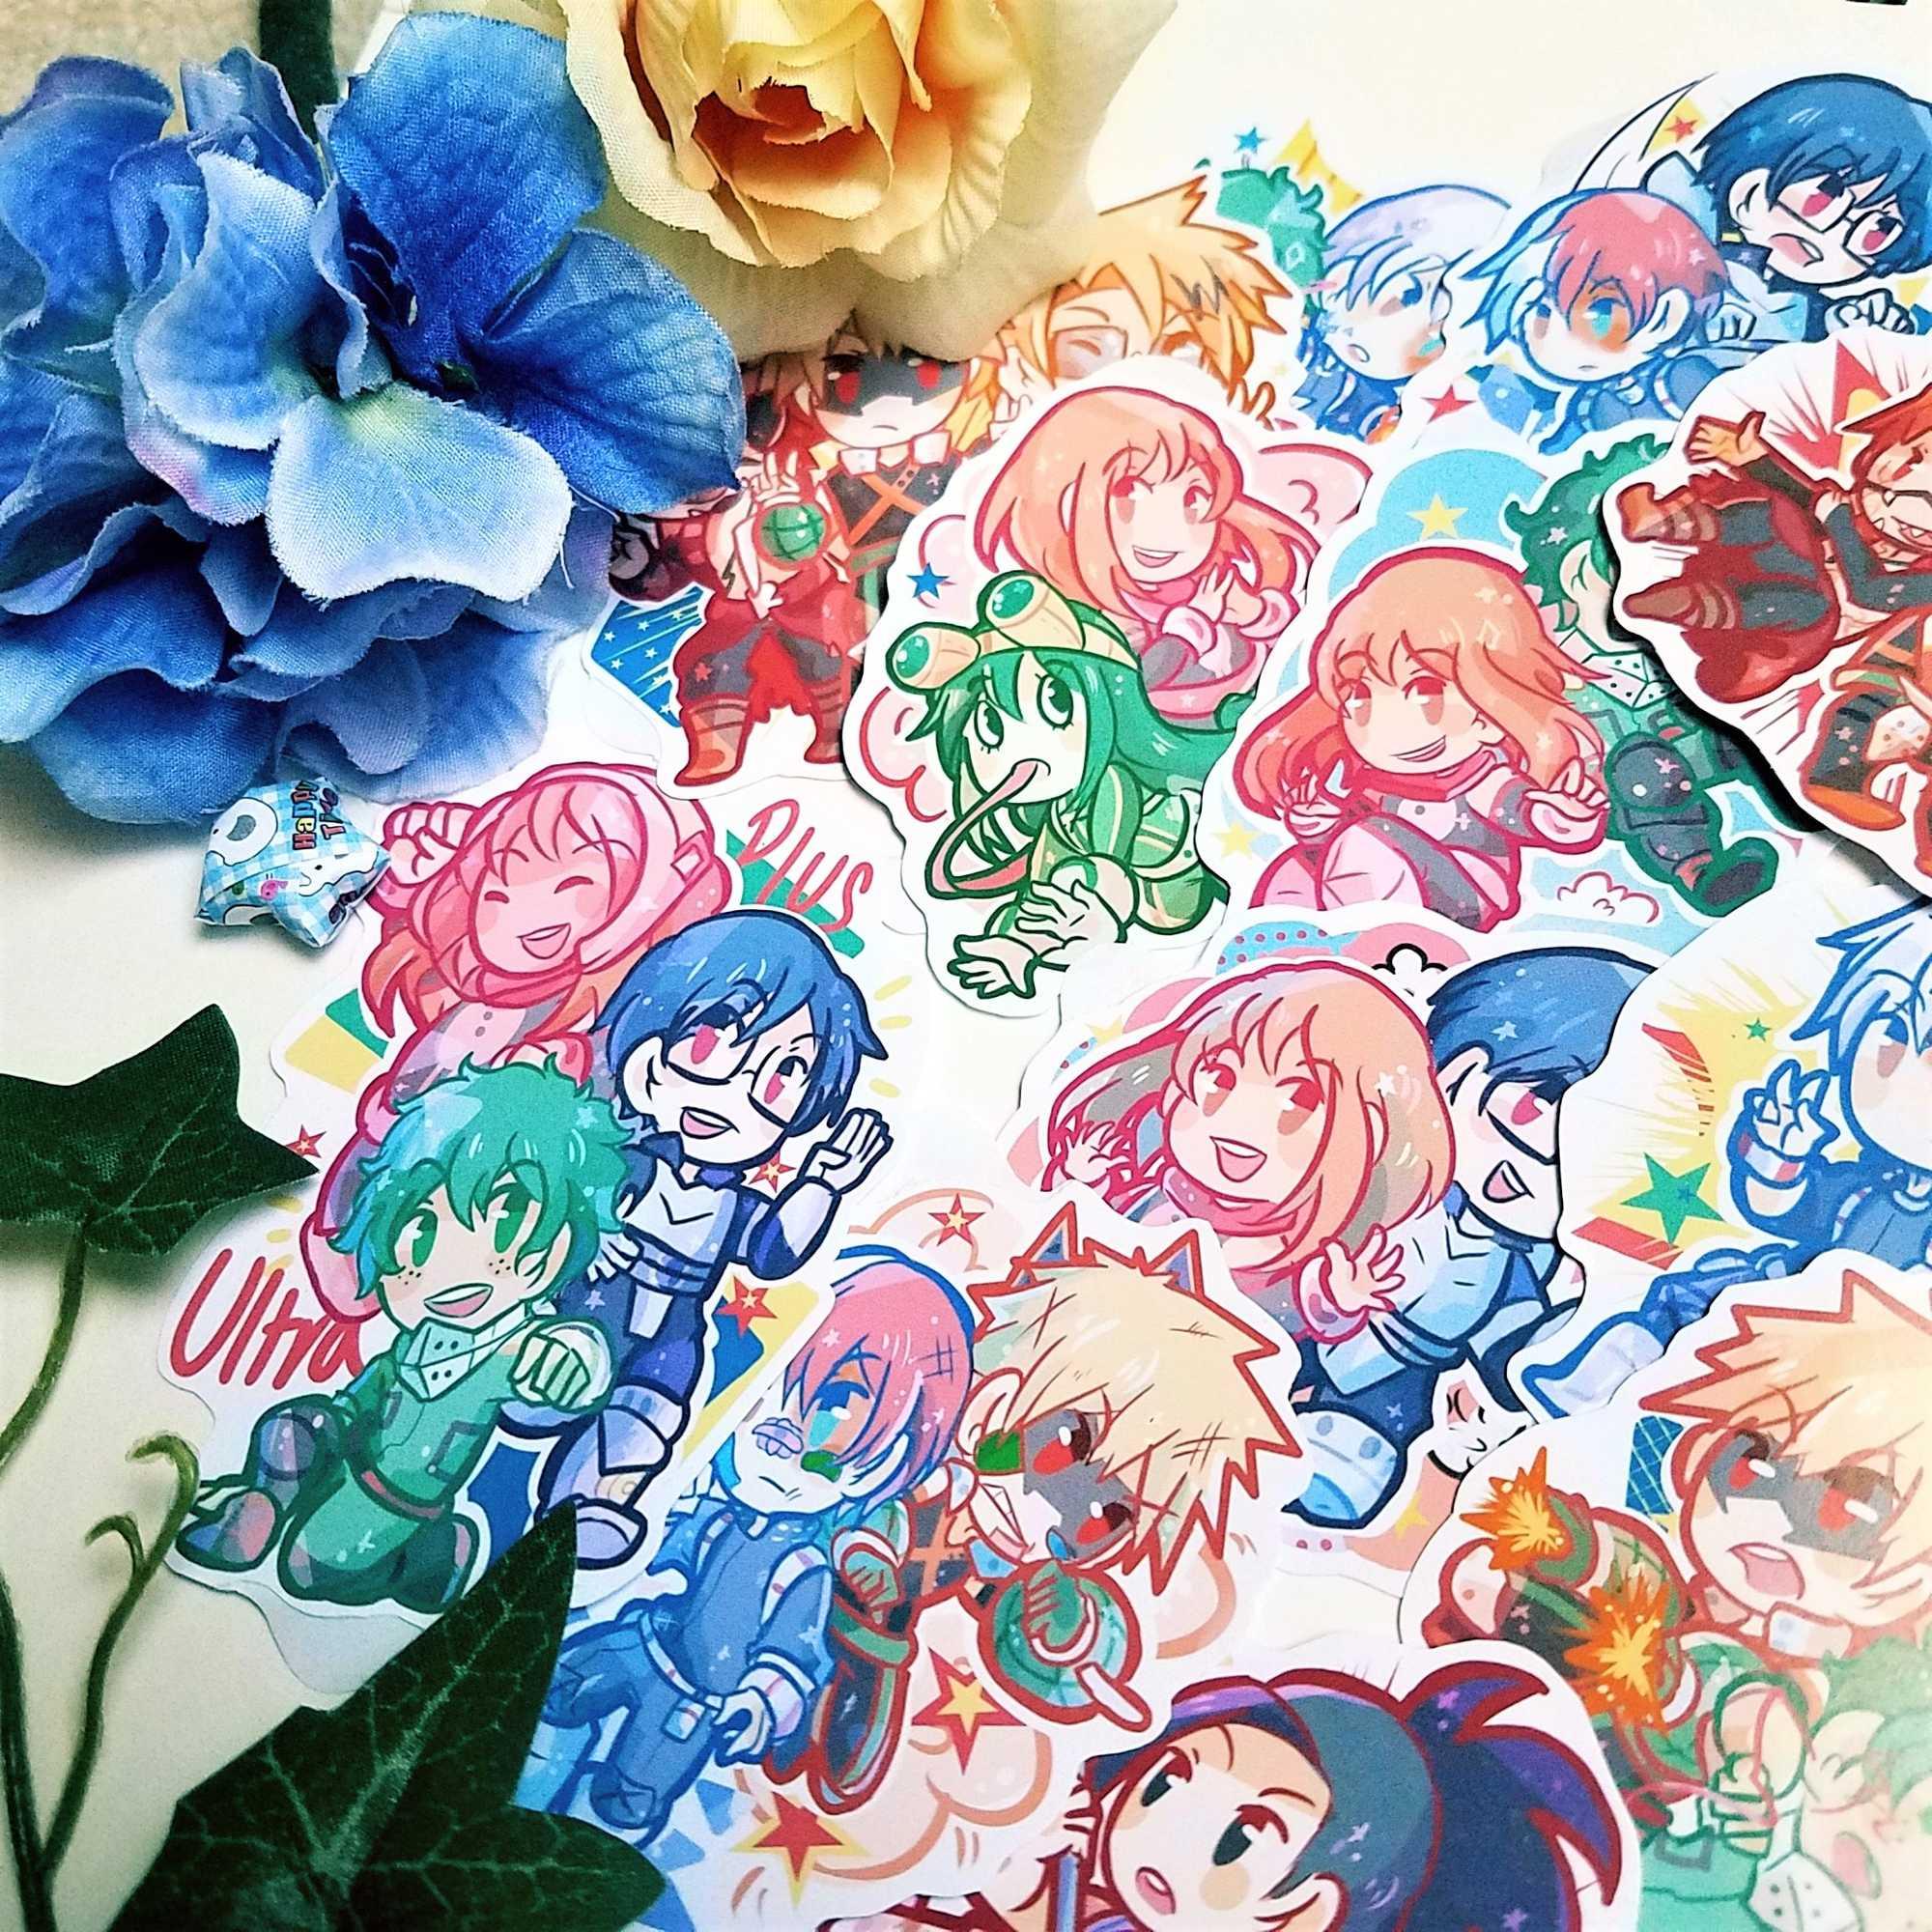 Color 24 Stil 01 Izuku Bakugou Anime Schl/üsselringe Anh/änger H/ängende Verzierung Elibeauty lunanana My Hero Academia Schl/üsselanh/änger